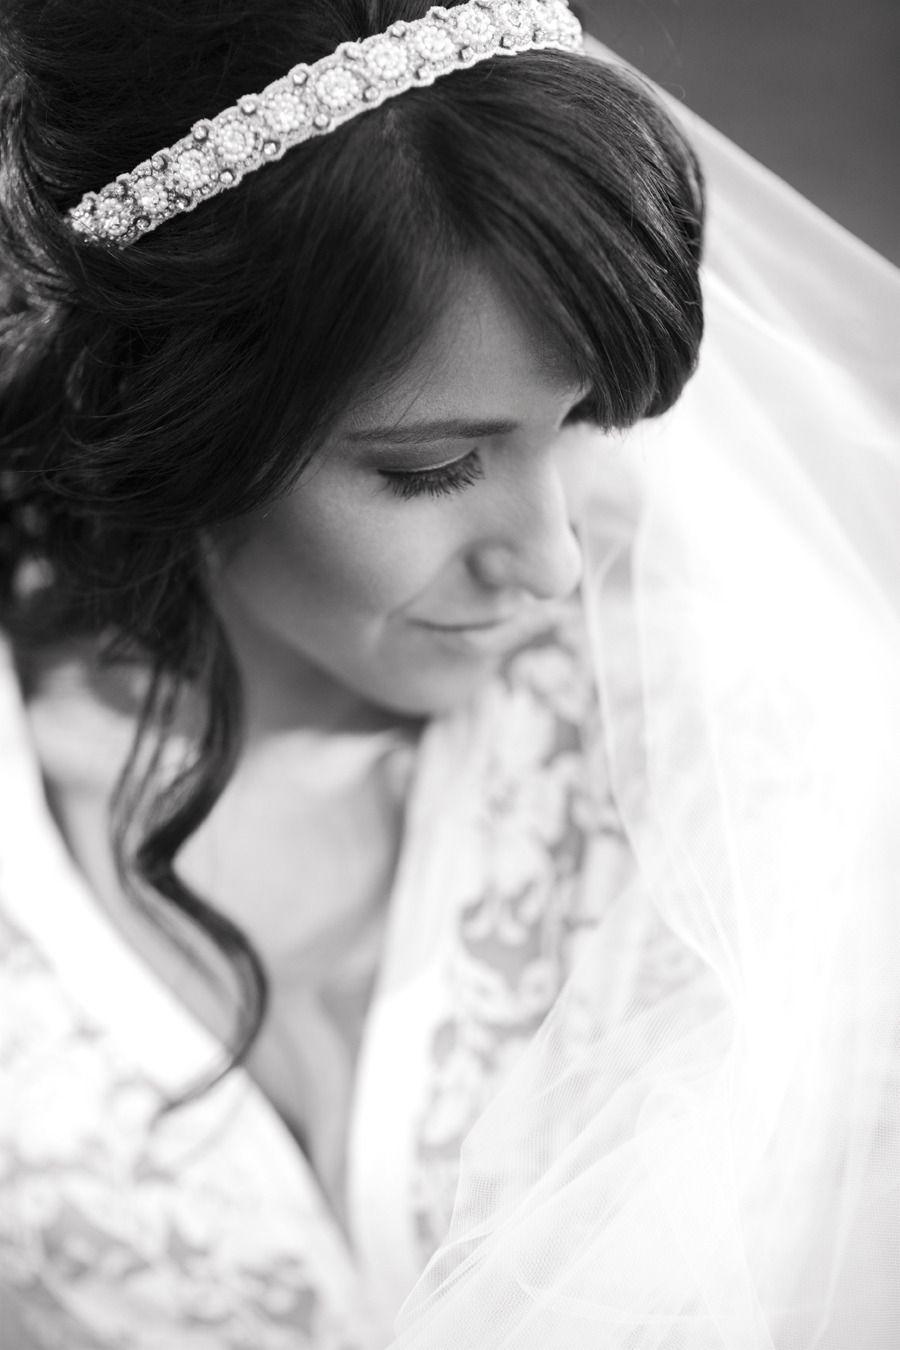 Omaha Wedding From Kale Fitch Films Amanda K Photography Wedding Hair And Makeup Hairdo Wedding Wedding Hairstyles